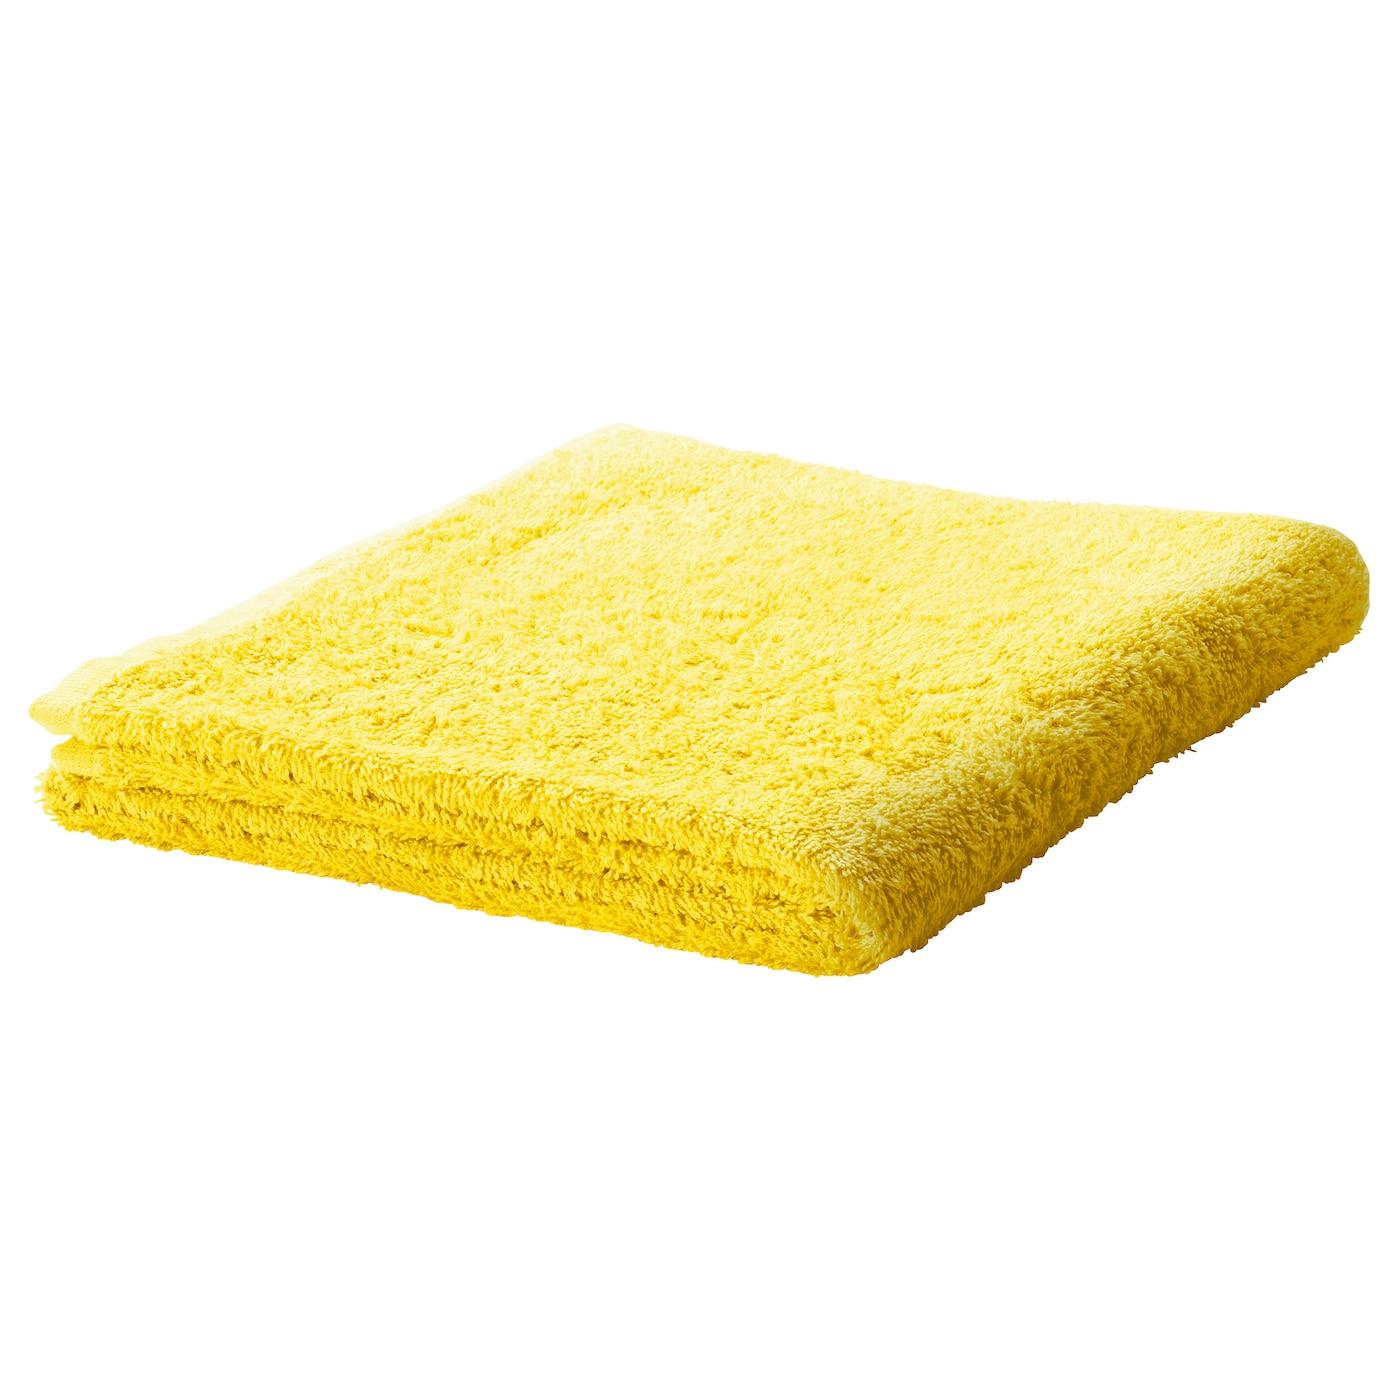 Ikea bathroom towels - Ikea H Ren Bath Towel The Long Fine Fibres Of Combed Cotton Create A Soft And